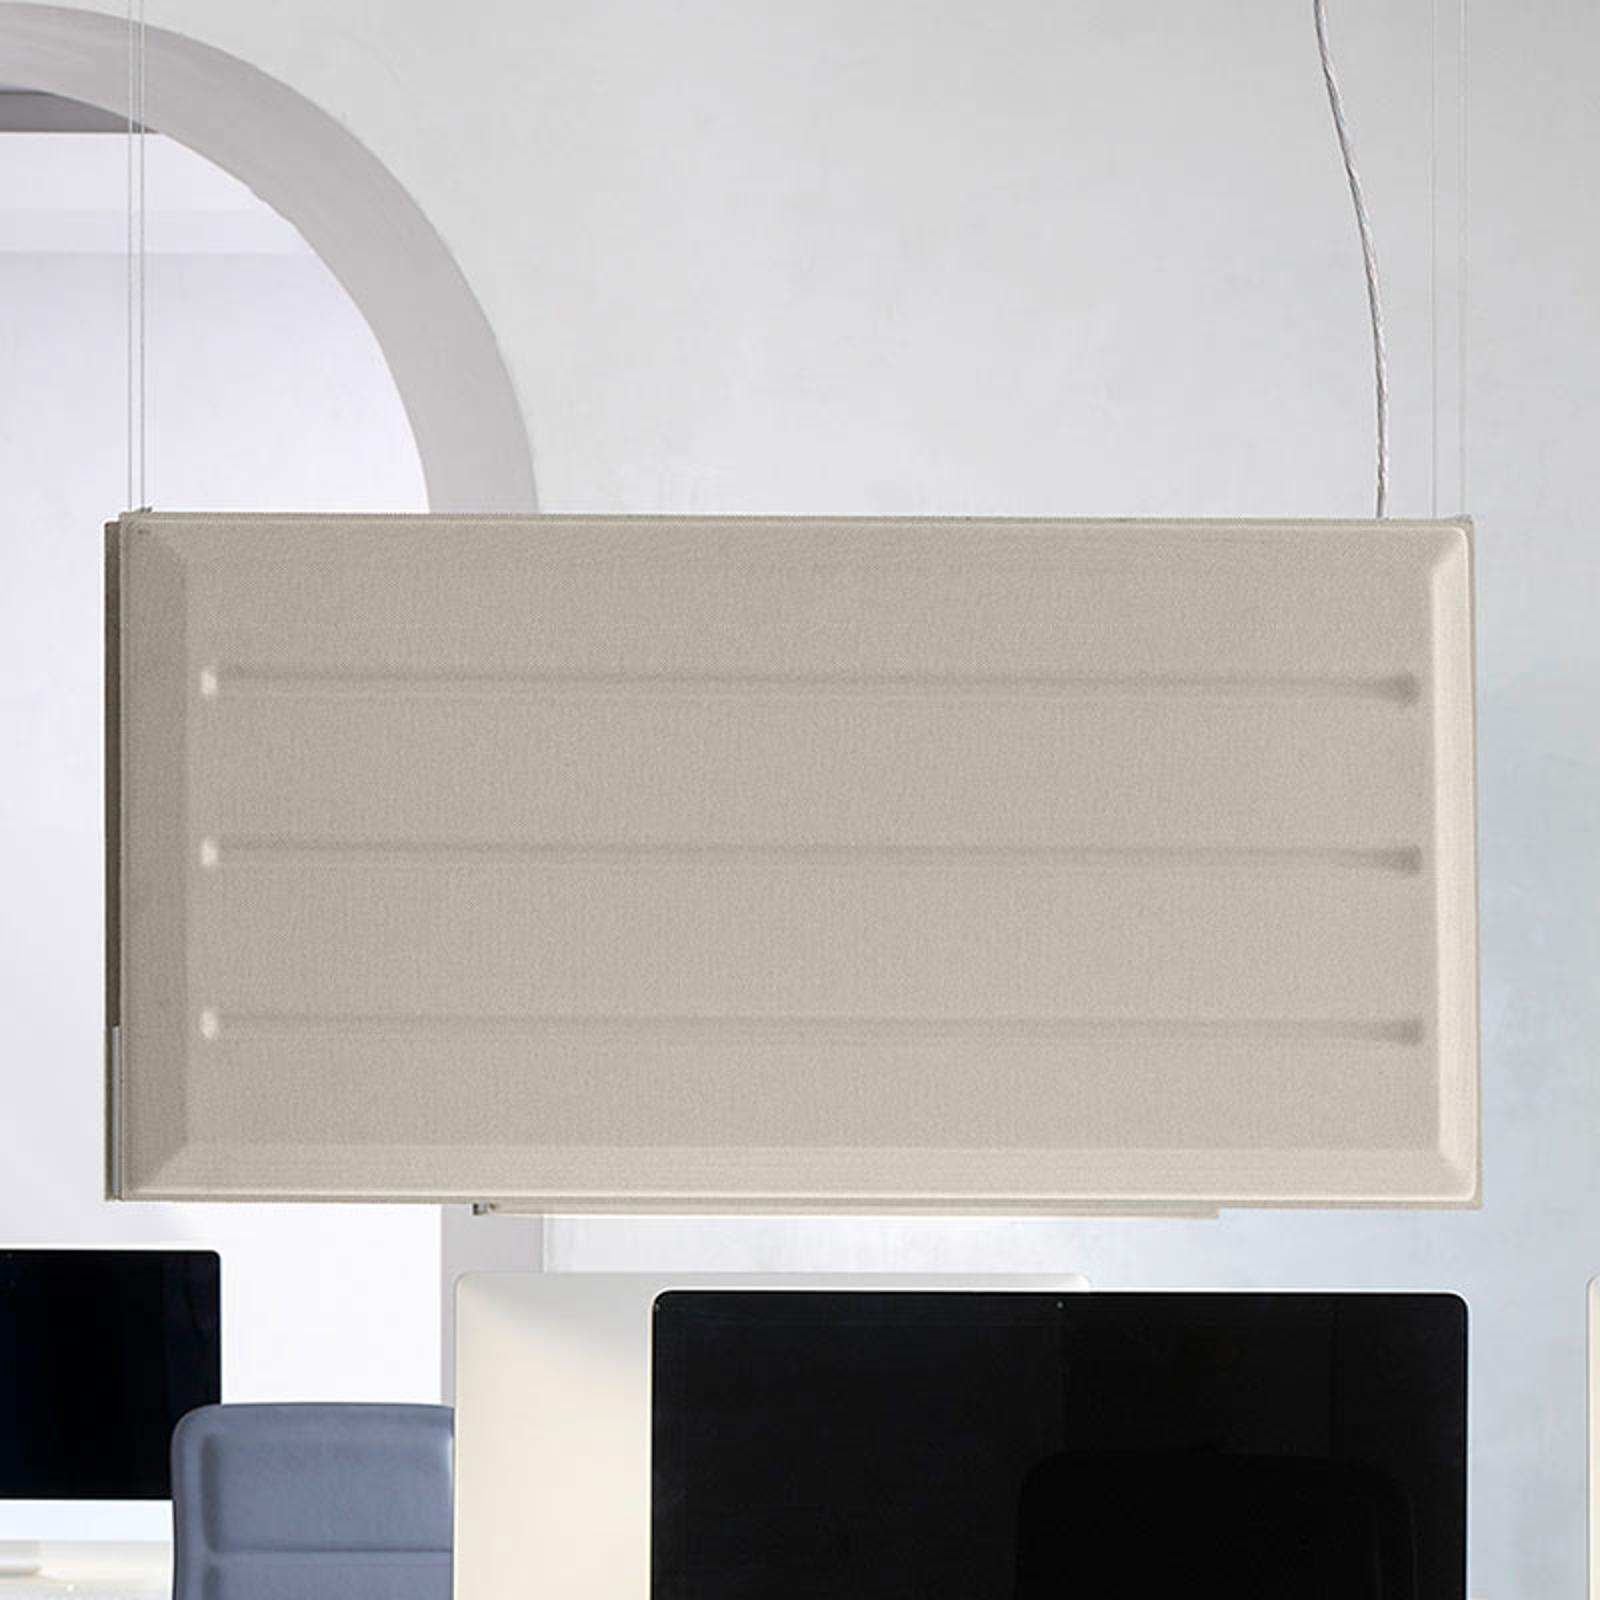 Luceplan Diade LED-Hängelampe vertikal beige 120cm